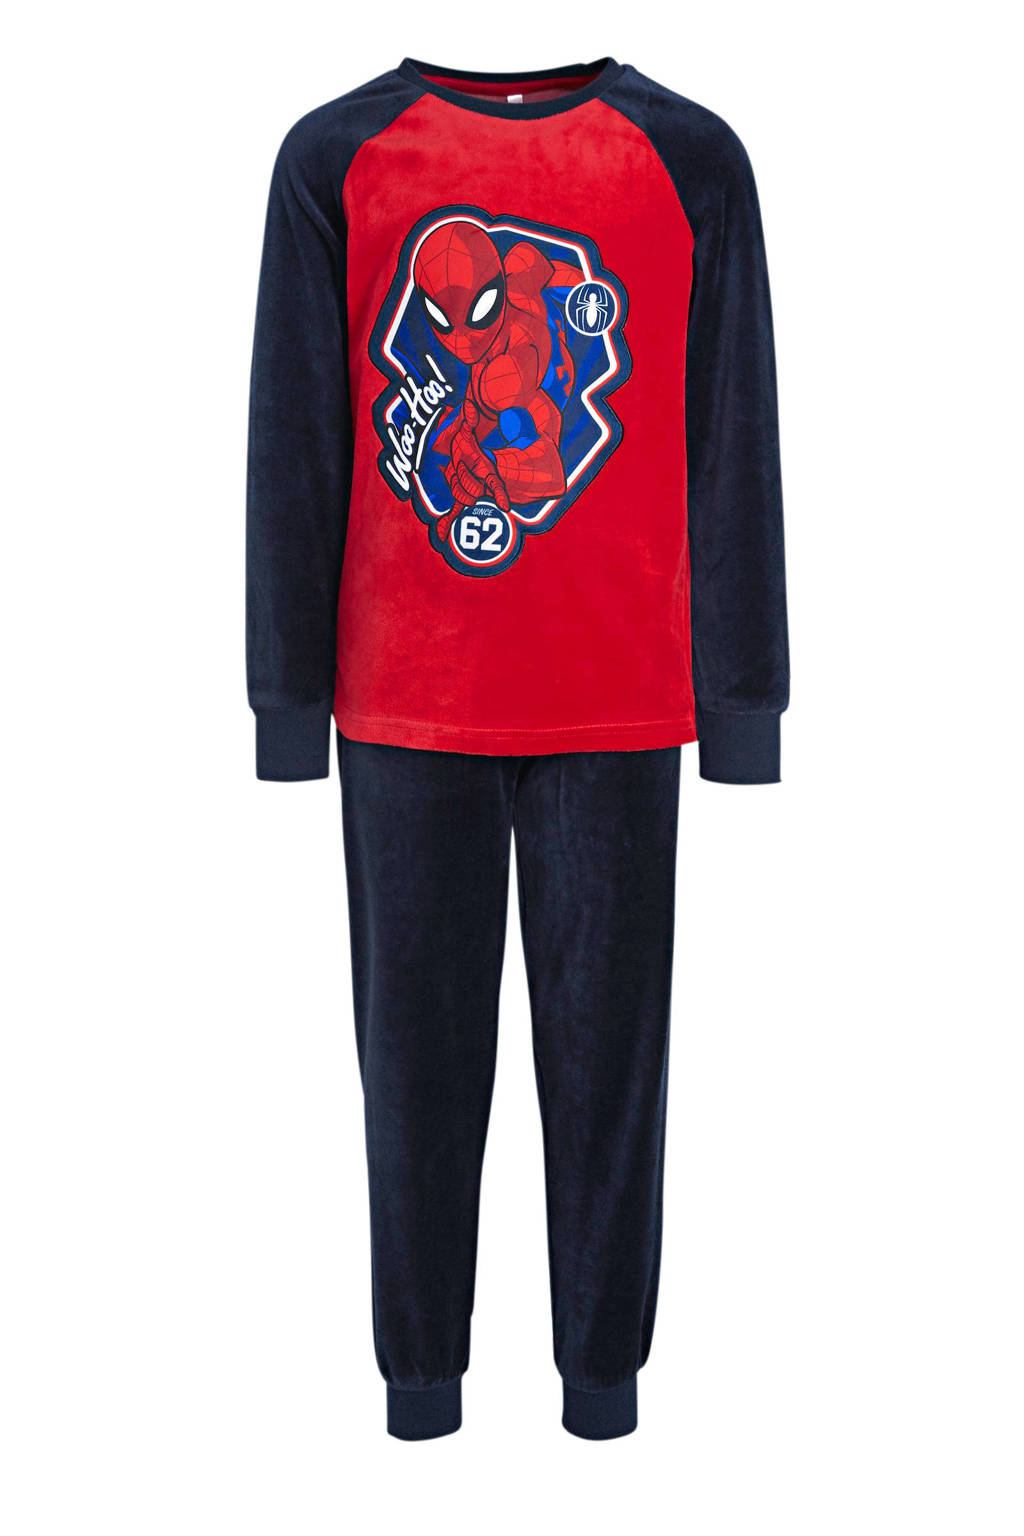 C&A Spiderman   pyjama Spiderman donkerblauw/rood, Rood/donkerblauw